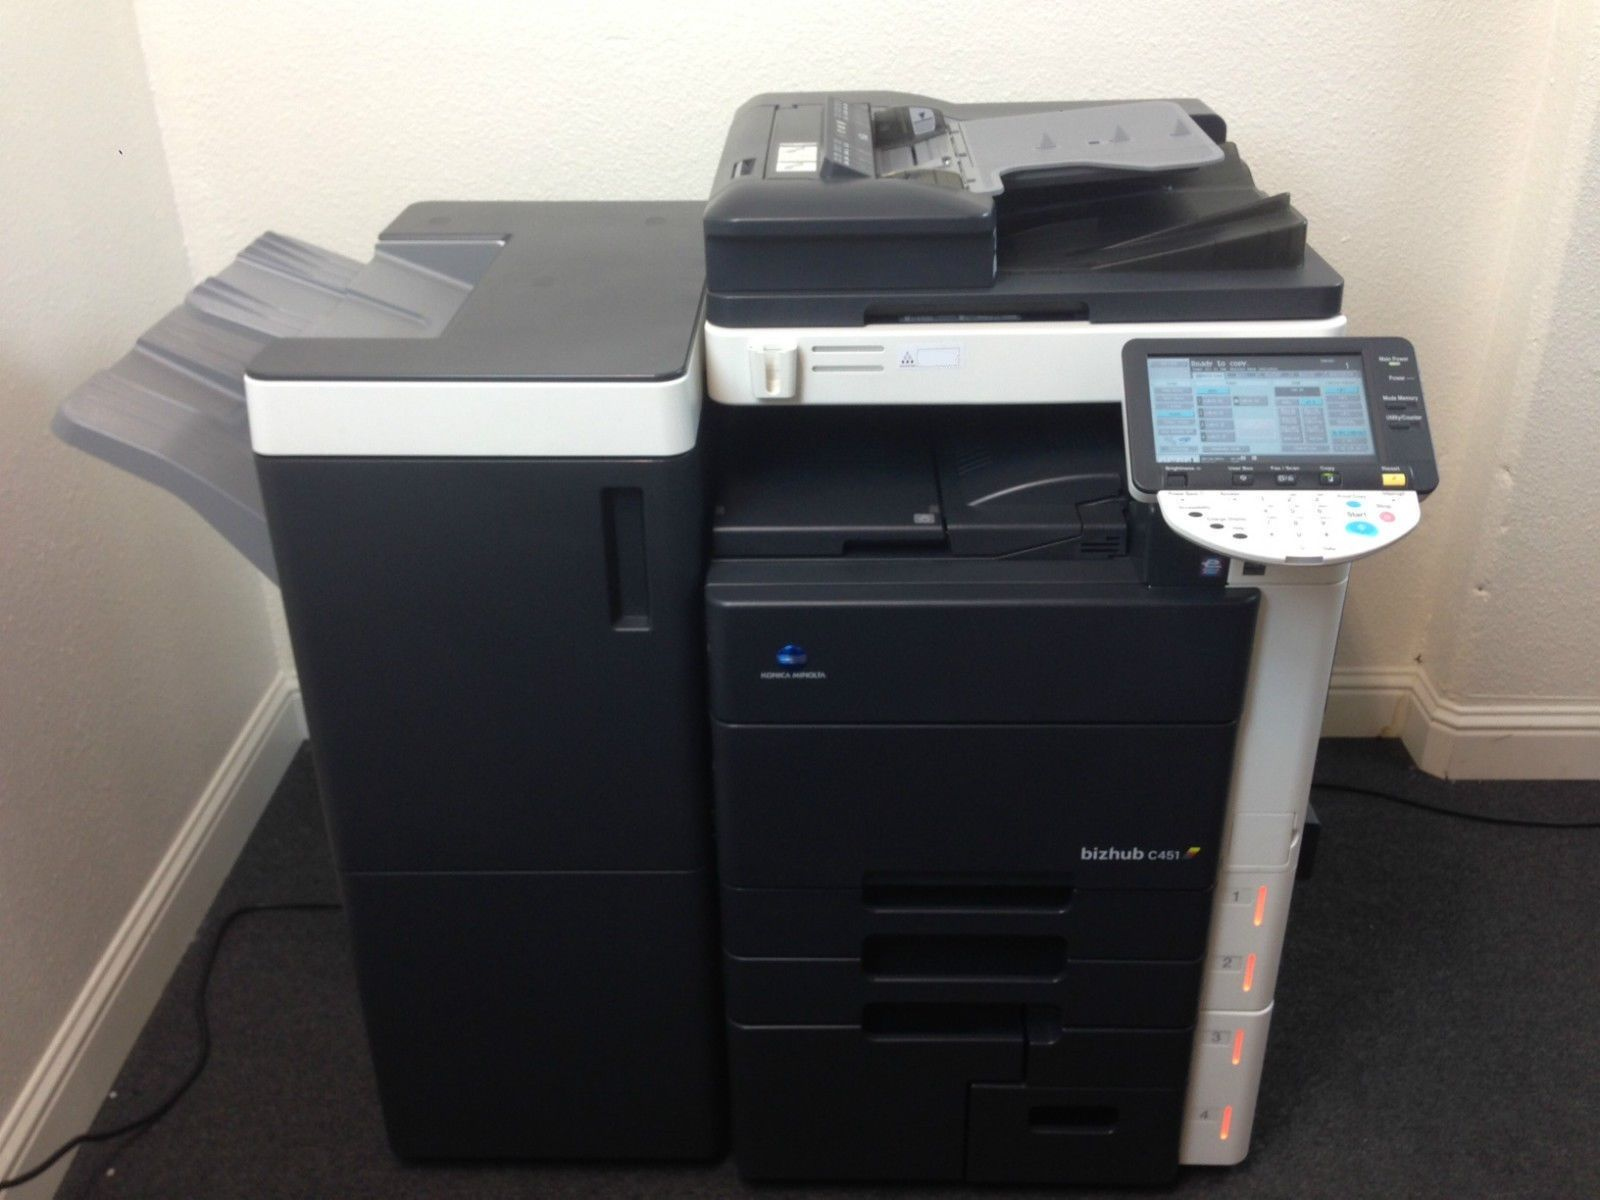 Konica Minolta Bizhub C451 Copier Printer Scanner Network FREE SHIPPING in USA by Konica Minolta